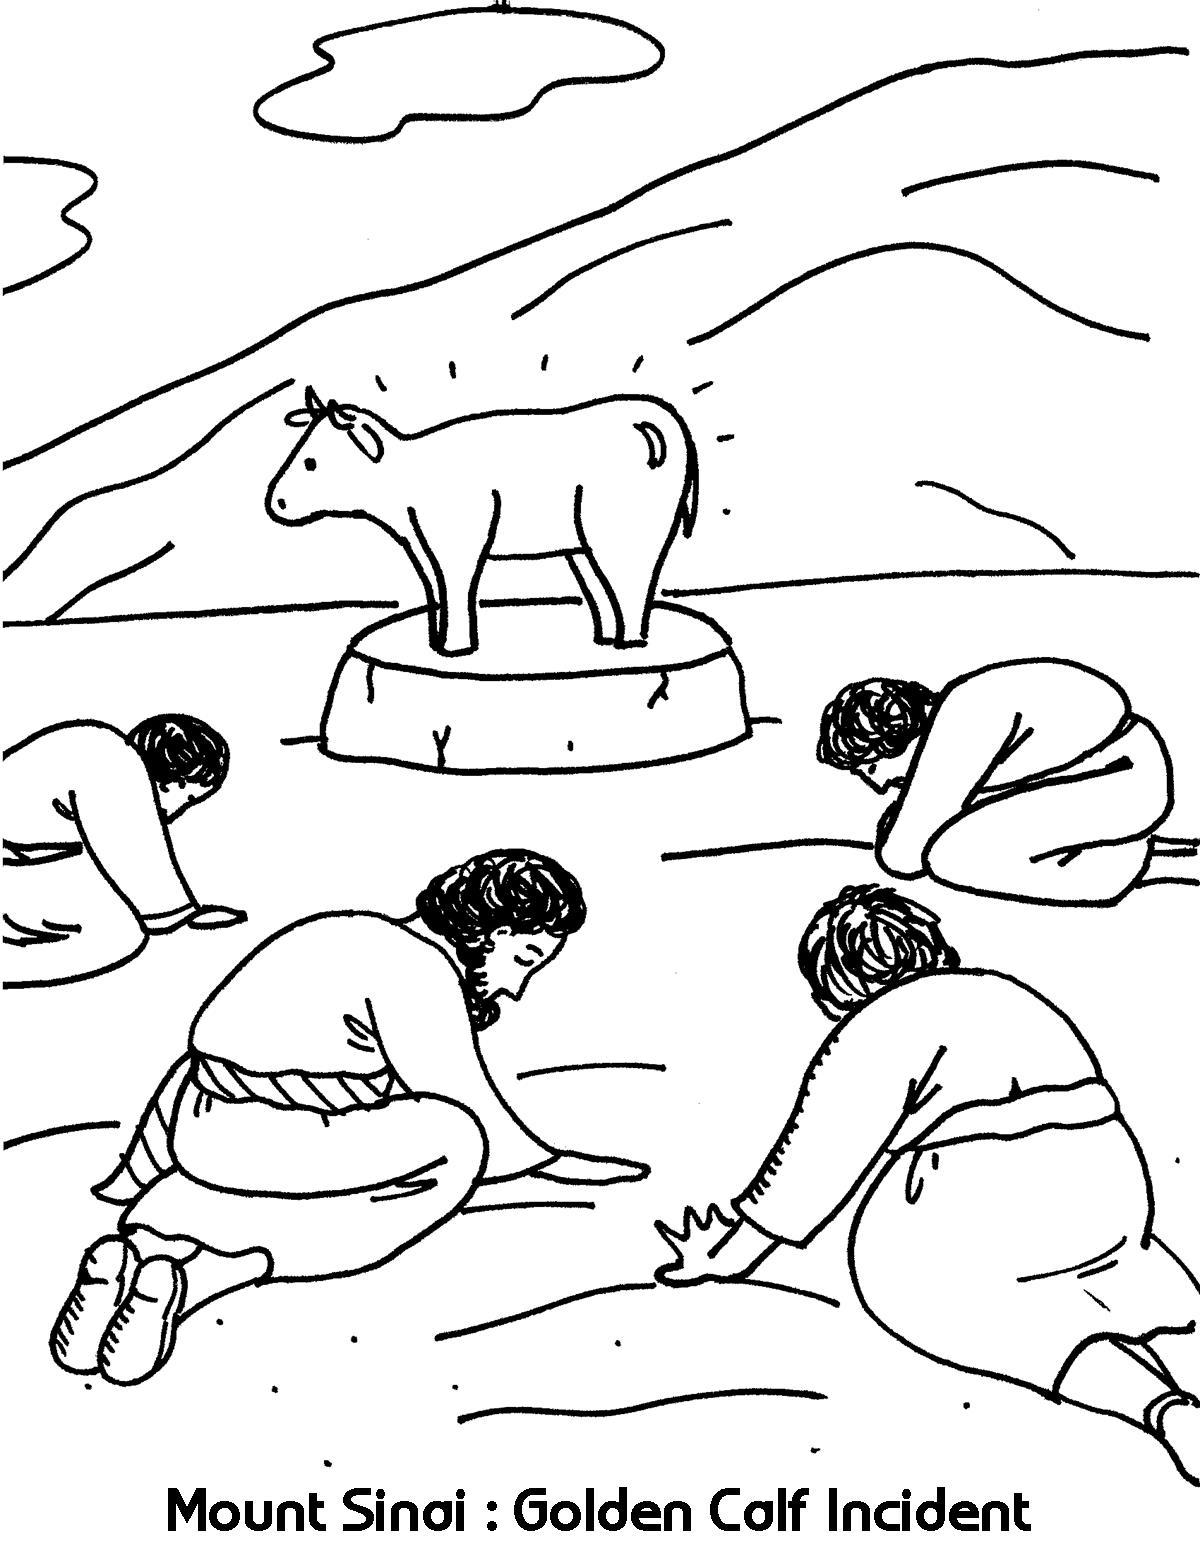 The Golden Calf Coloring Page Mount Sinai Golden Calf Incident Coloring Sheets Wesleyan Kids